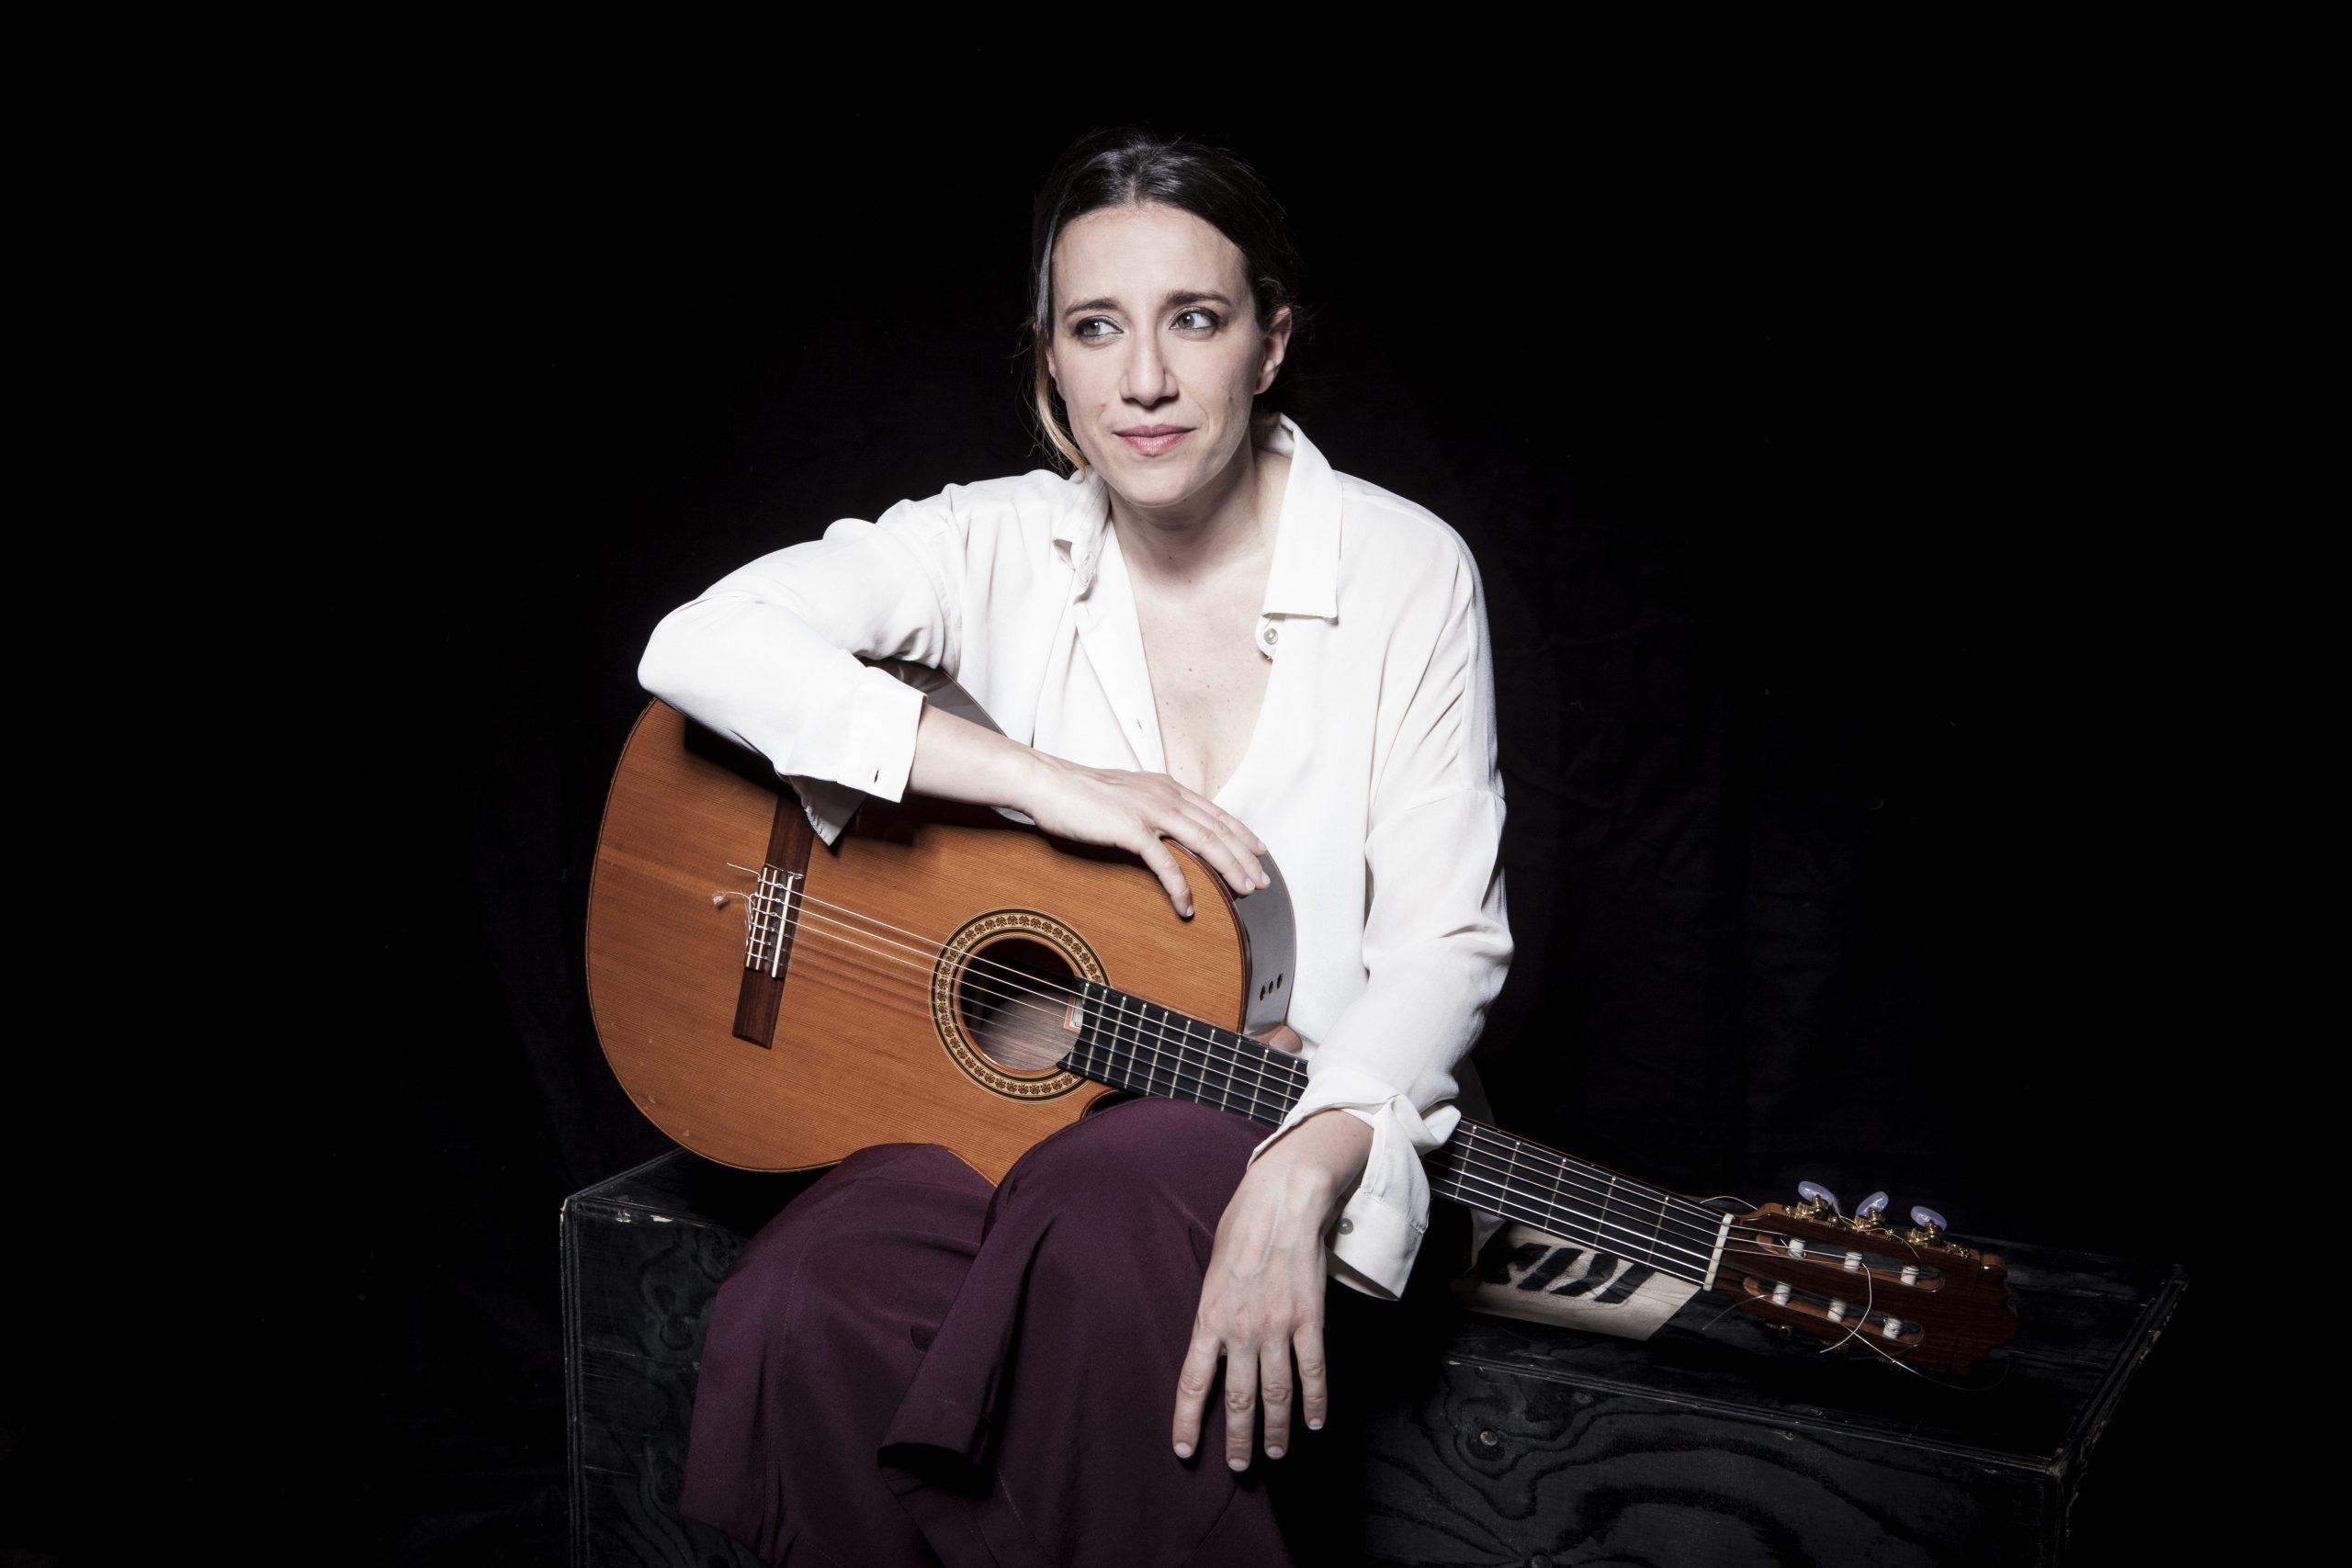 Dieci lune</br>Intervista a Cristina Renzetti